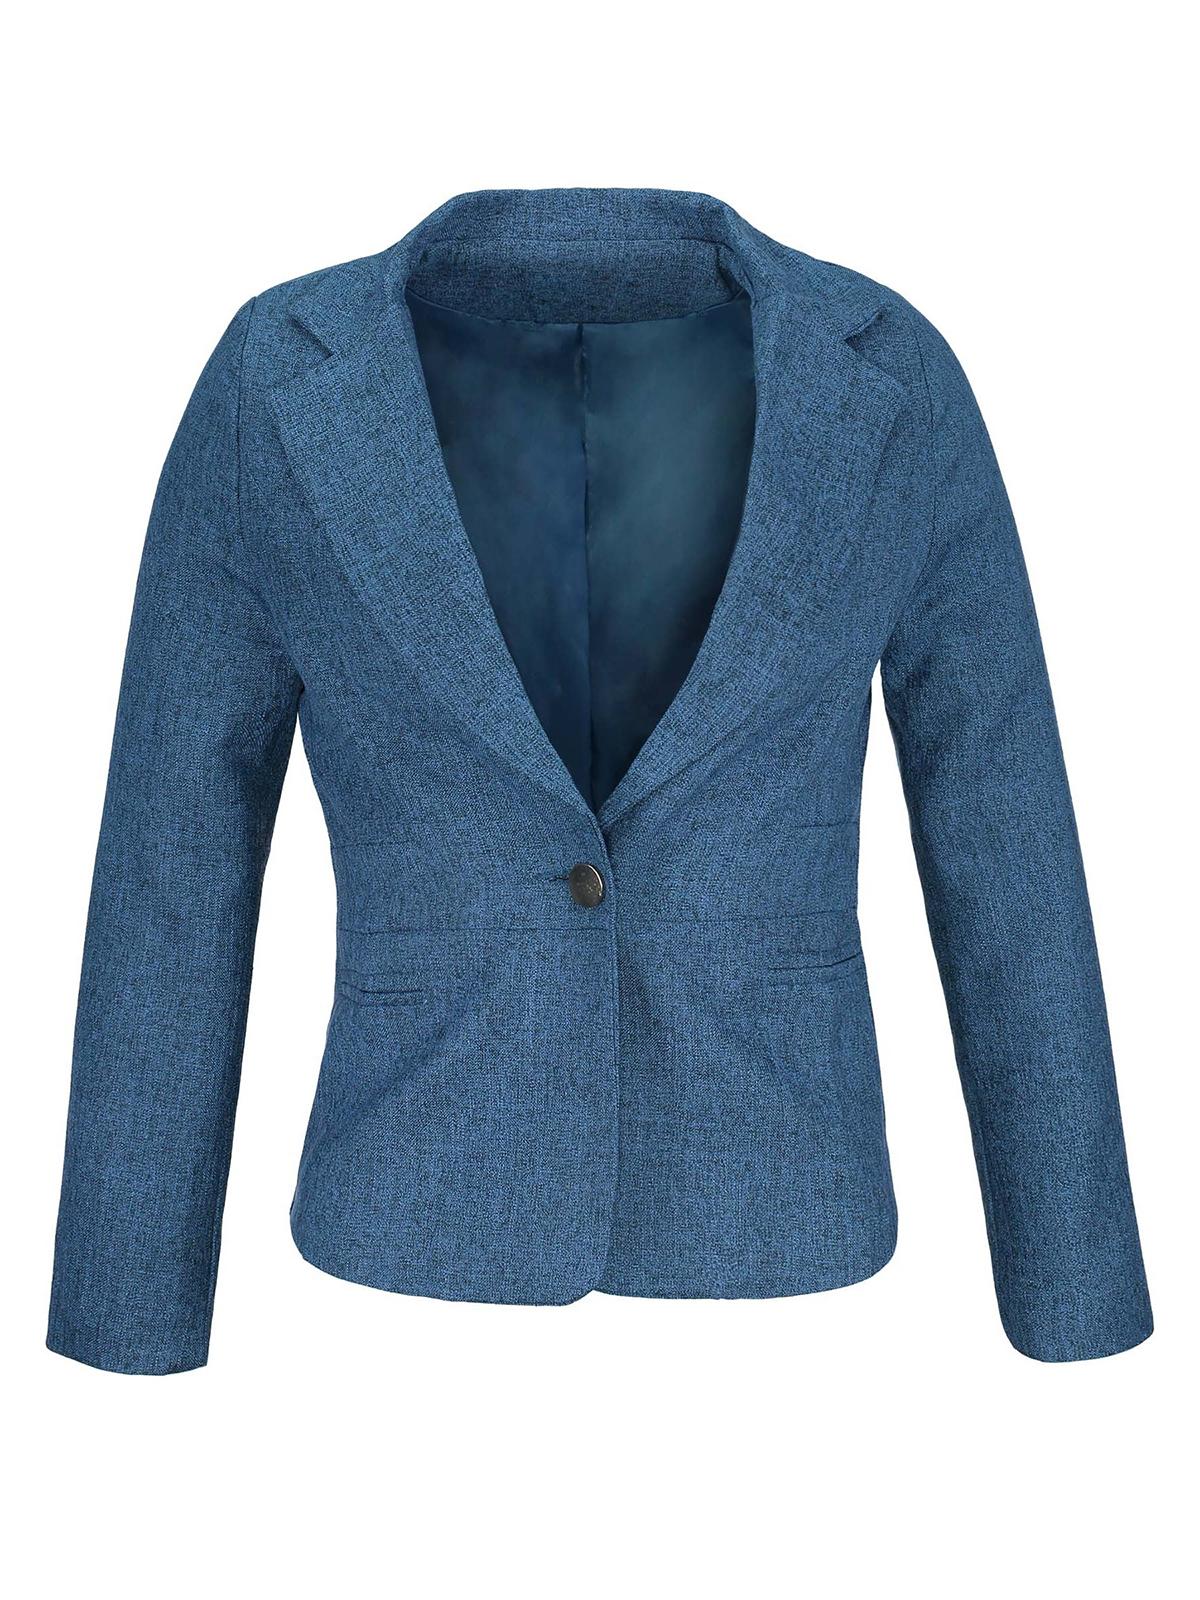 NCN Ladies blazer